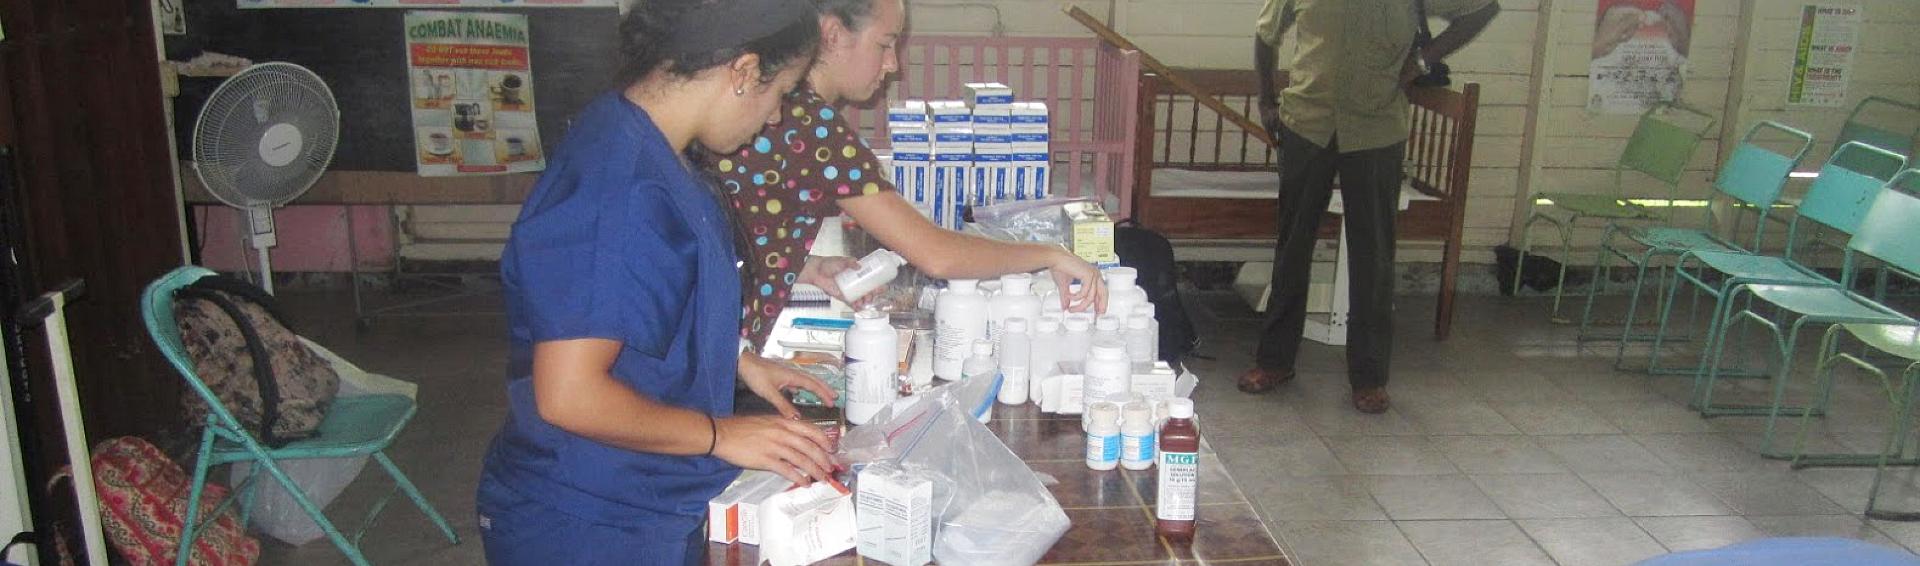 displaying medicines